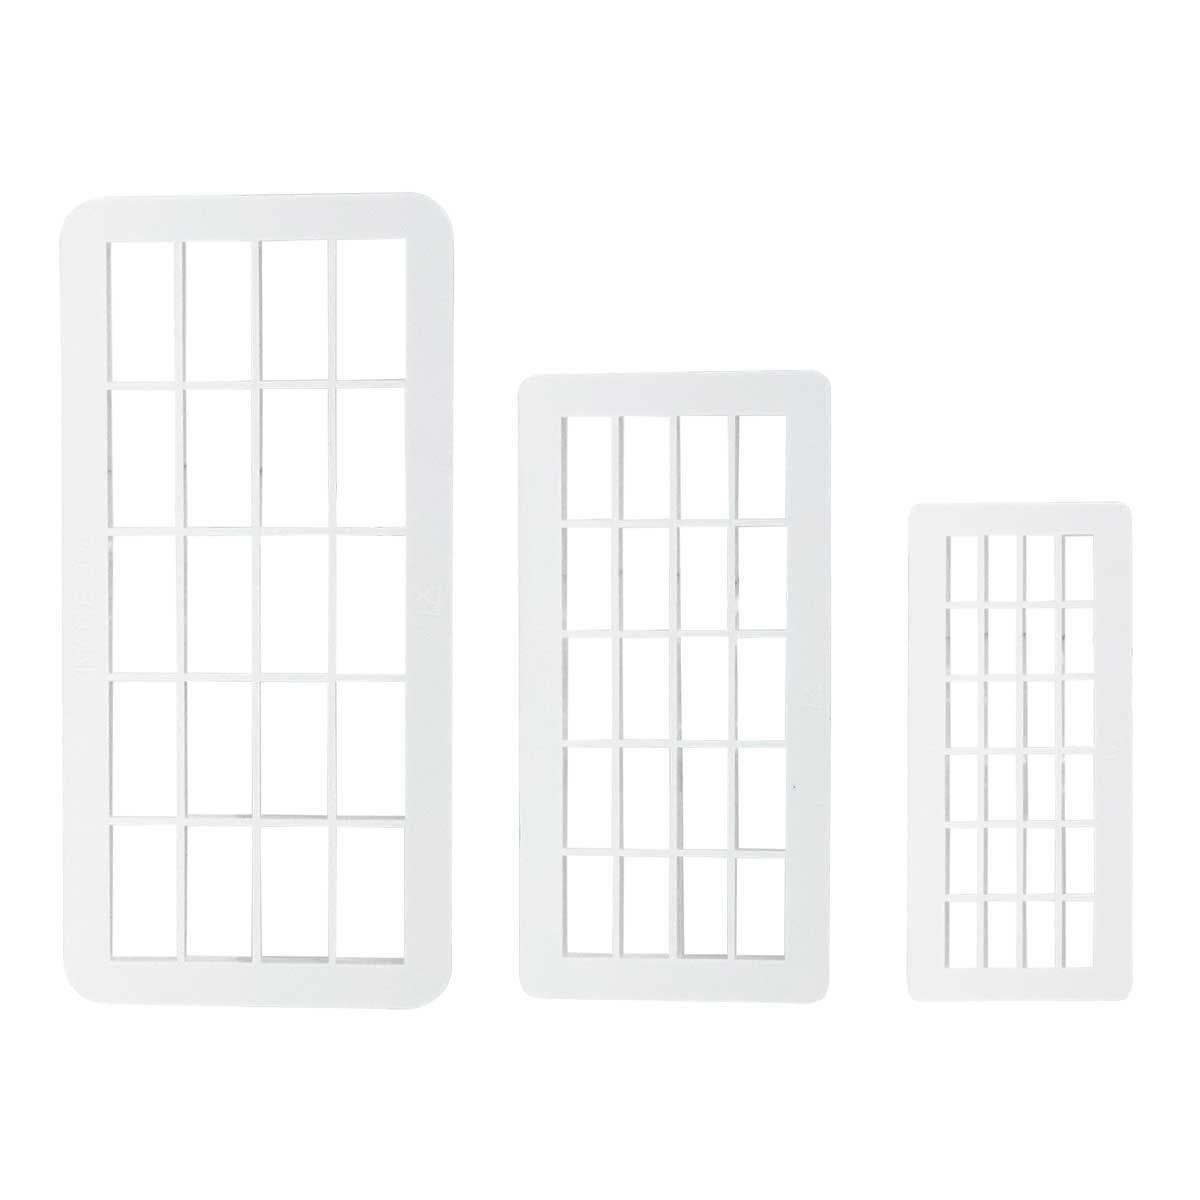 PME Geometric Multicutters -Set of 3 -BRICKS - Σετ 3τεμ Πολλαπλό Κουπ πατ Τουβλάκια